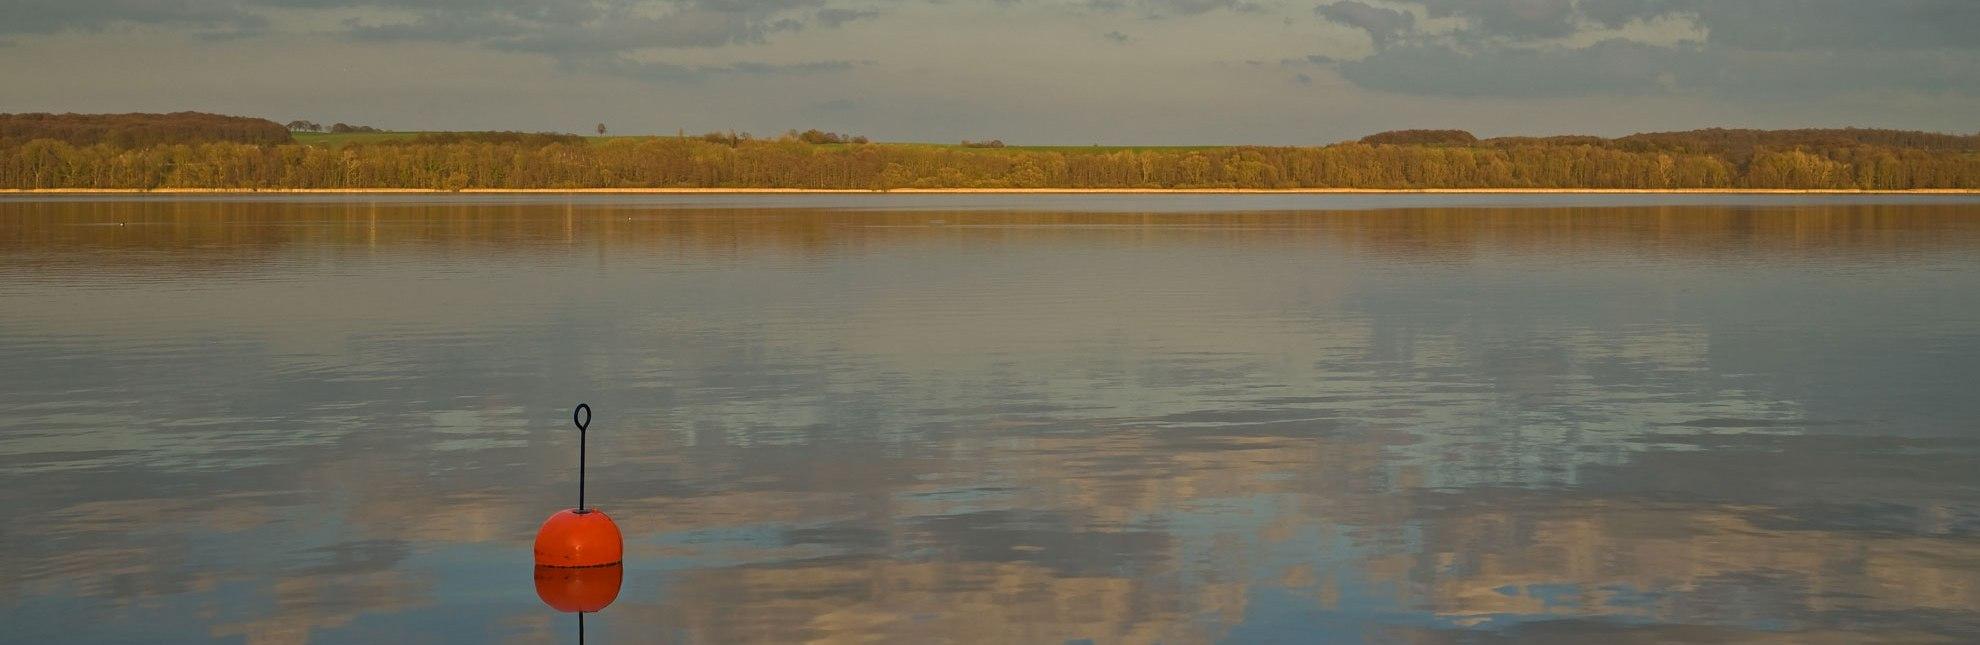 Blick auf den Ratzeburger See., © Thomas Ebelt / HLMS GmbH